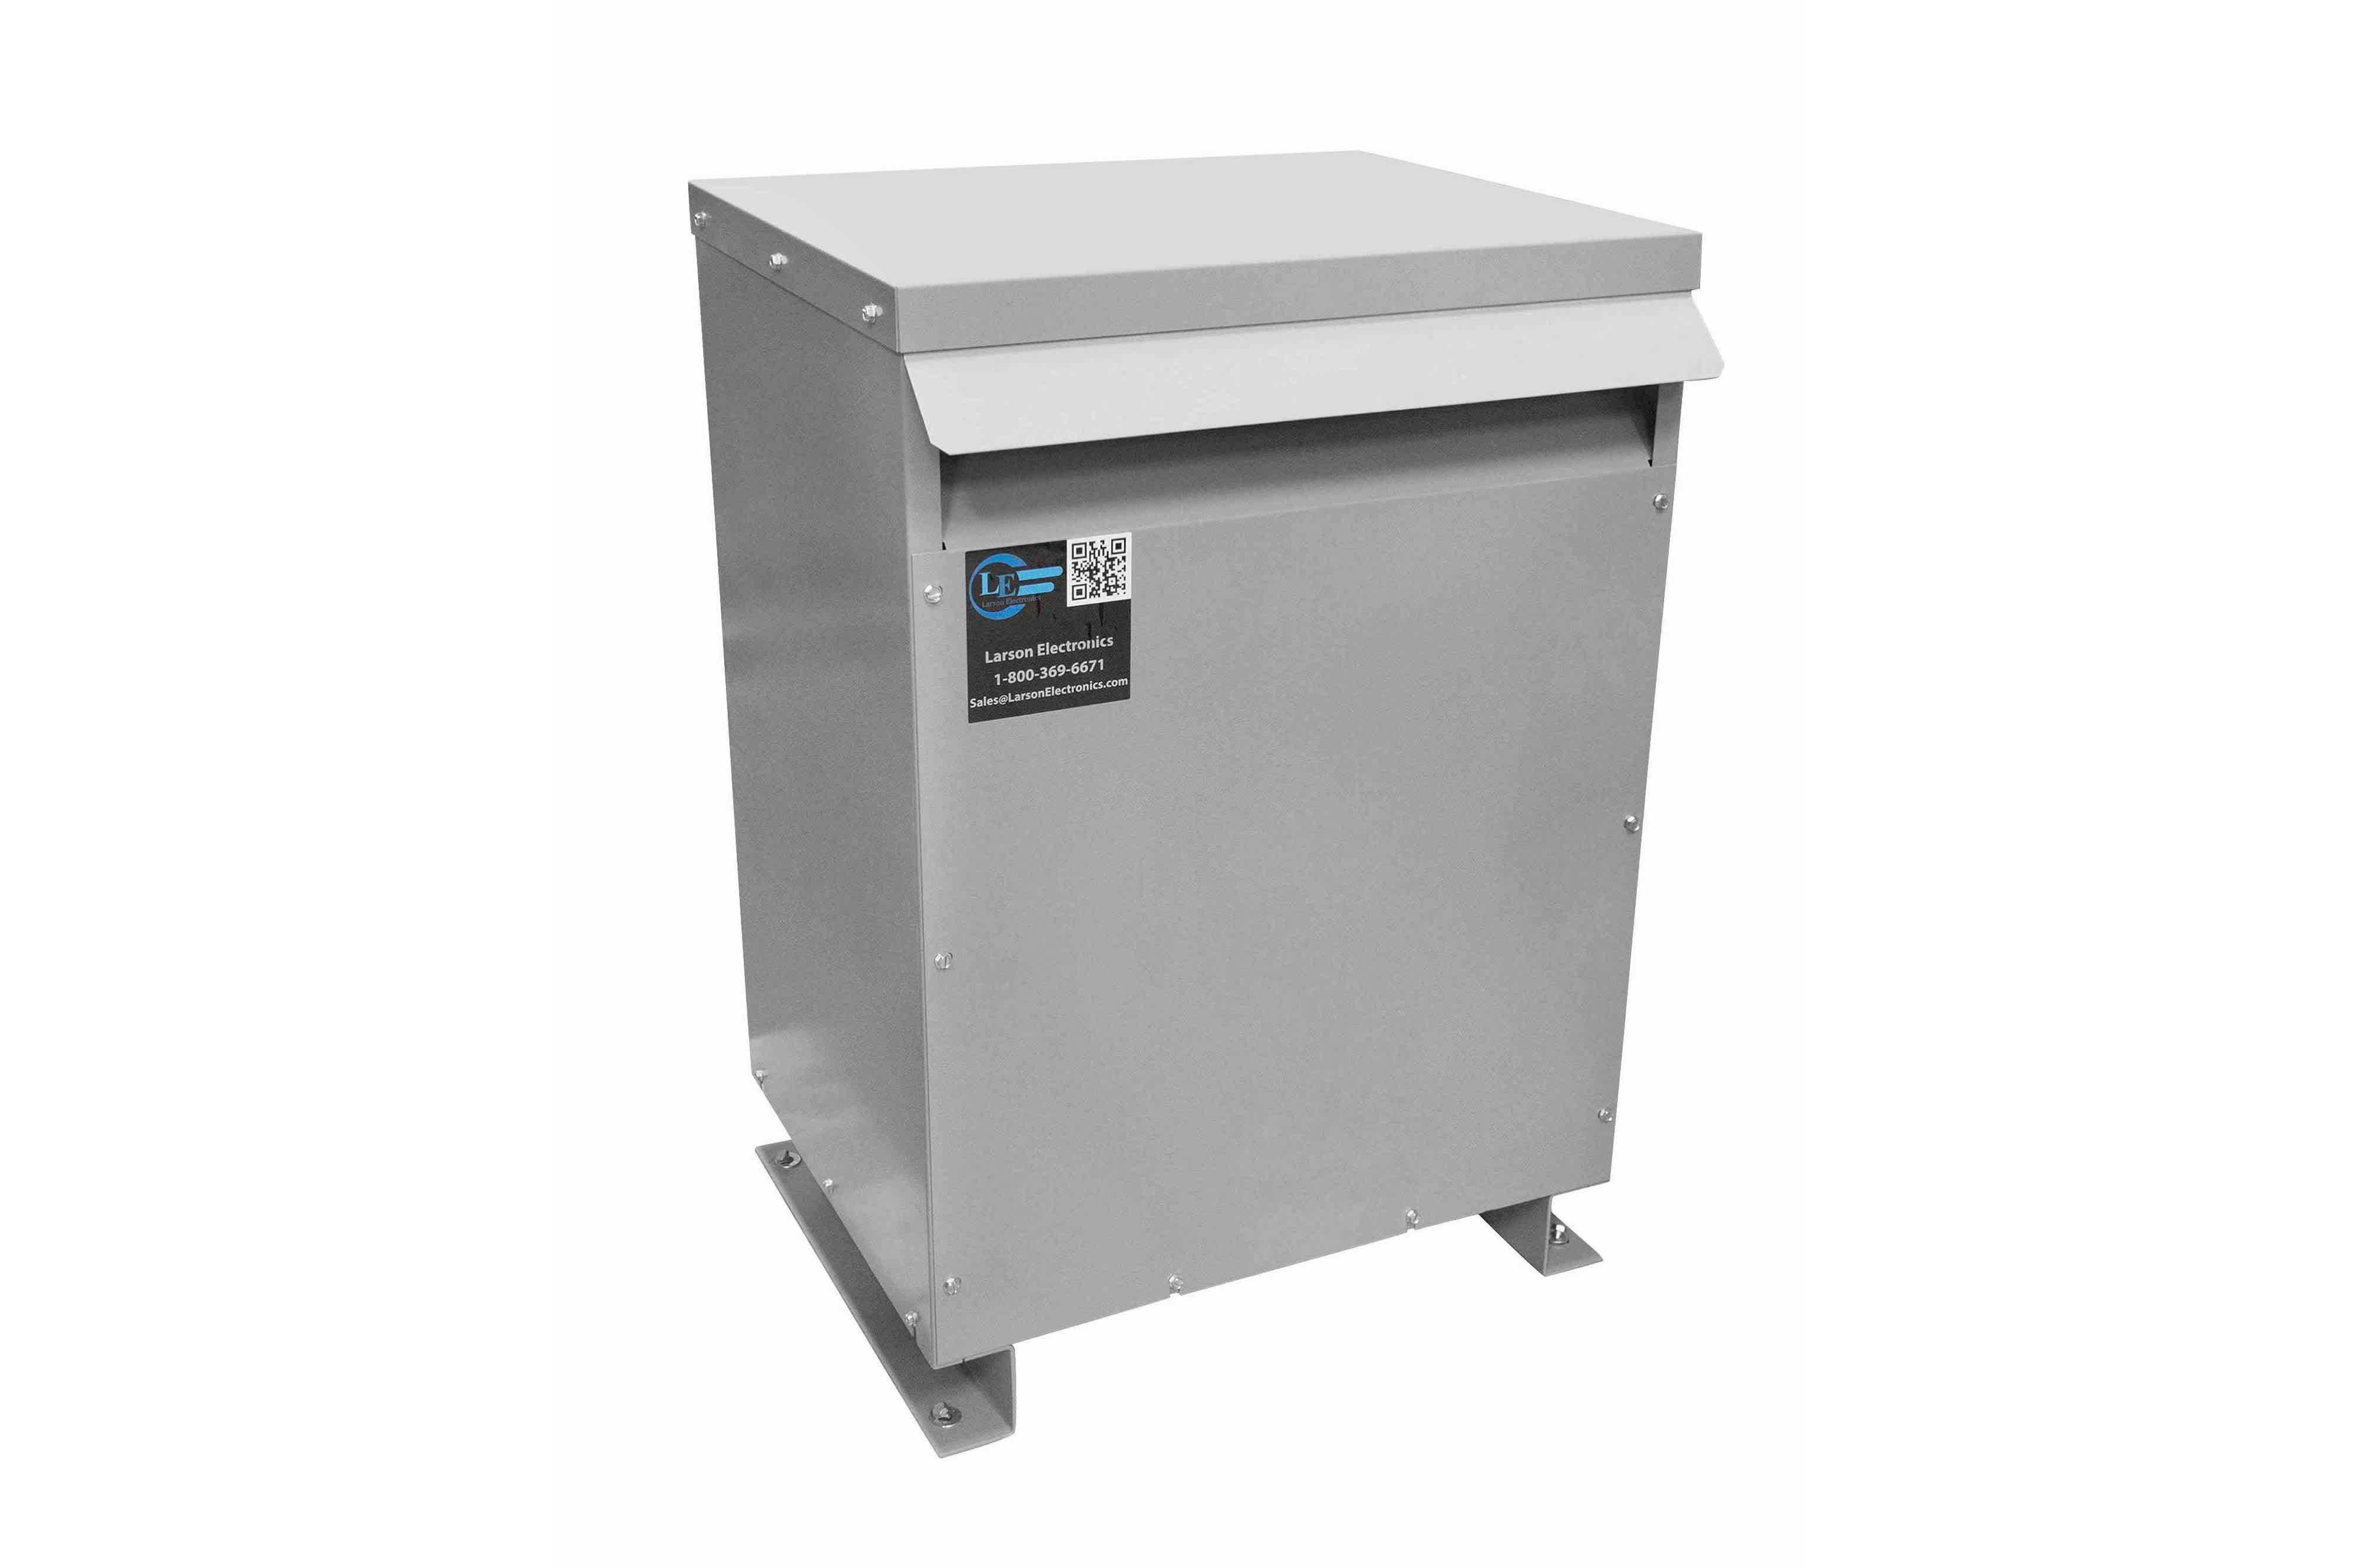 36 kVA 3PH Isolation Transformer, 600V Wye Primary, 380V Delta Secondary, N3R, Ventilated, 60 Hz